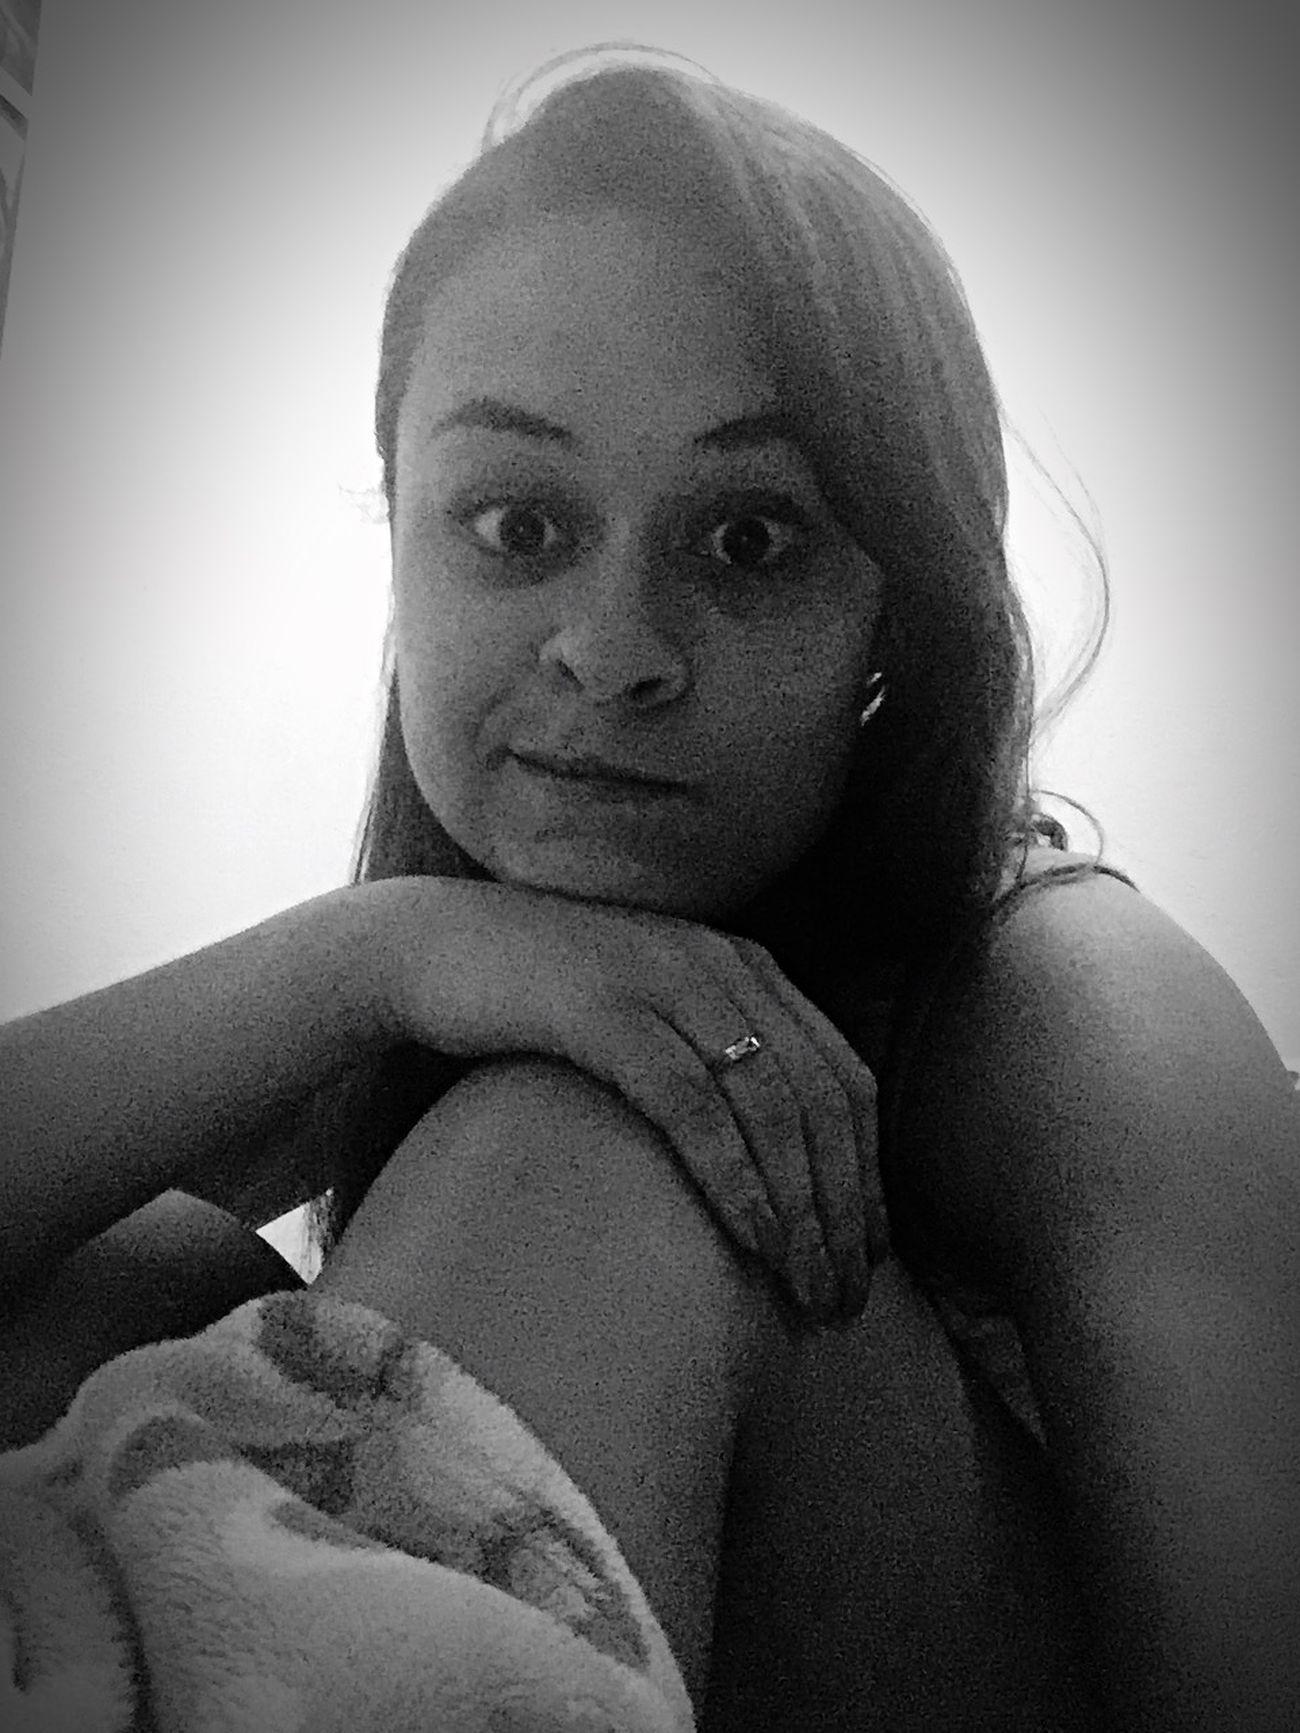 Afternoon!!! Relaxing That's Me Taking Photos A Felicidade Está Nas Pequenas Coisas!⛅️🌳🌴🌞 Iphone6 Hello World Modeling